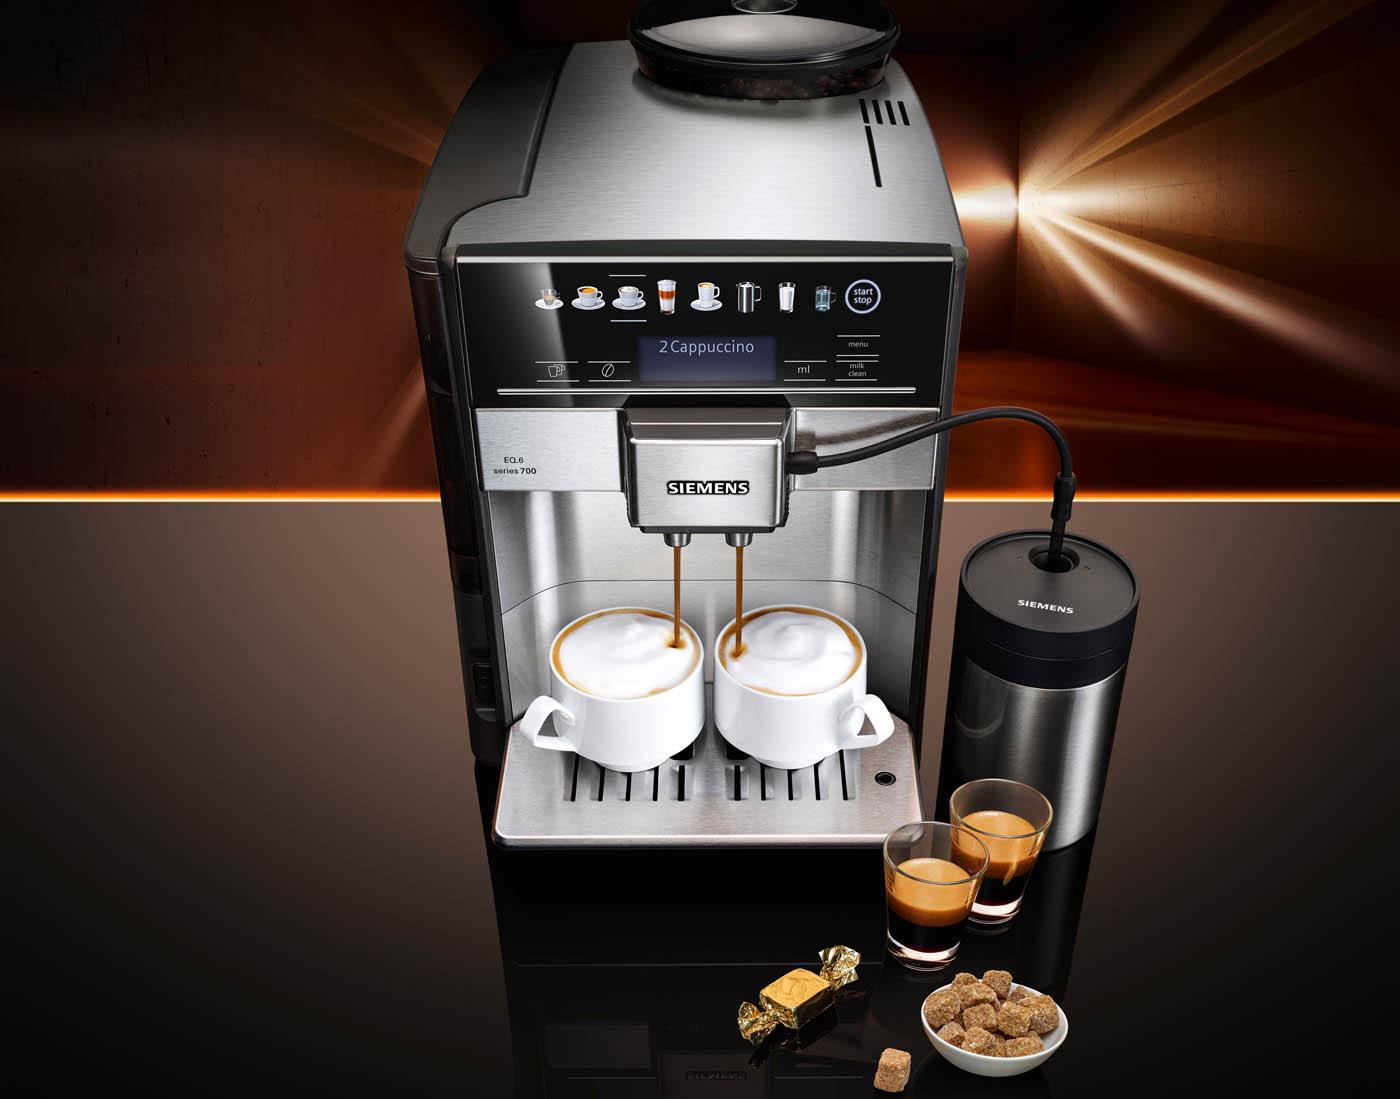 Koffievolautomaat EQ 6 van Siemens